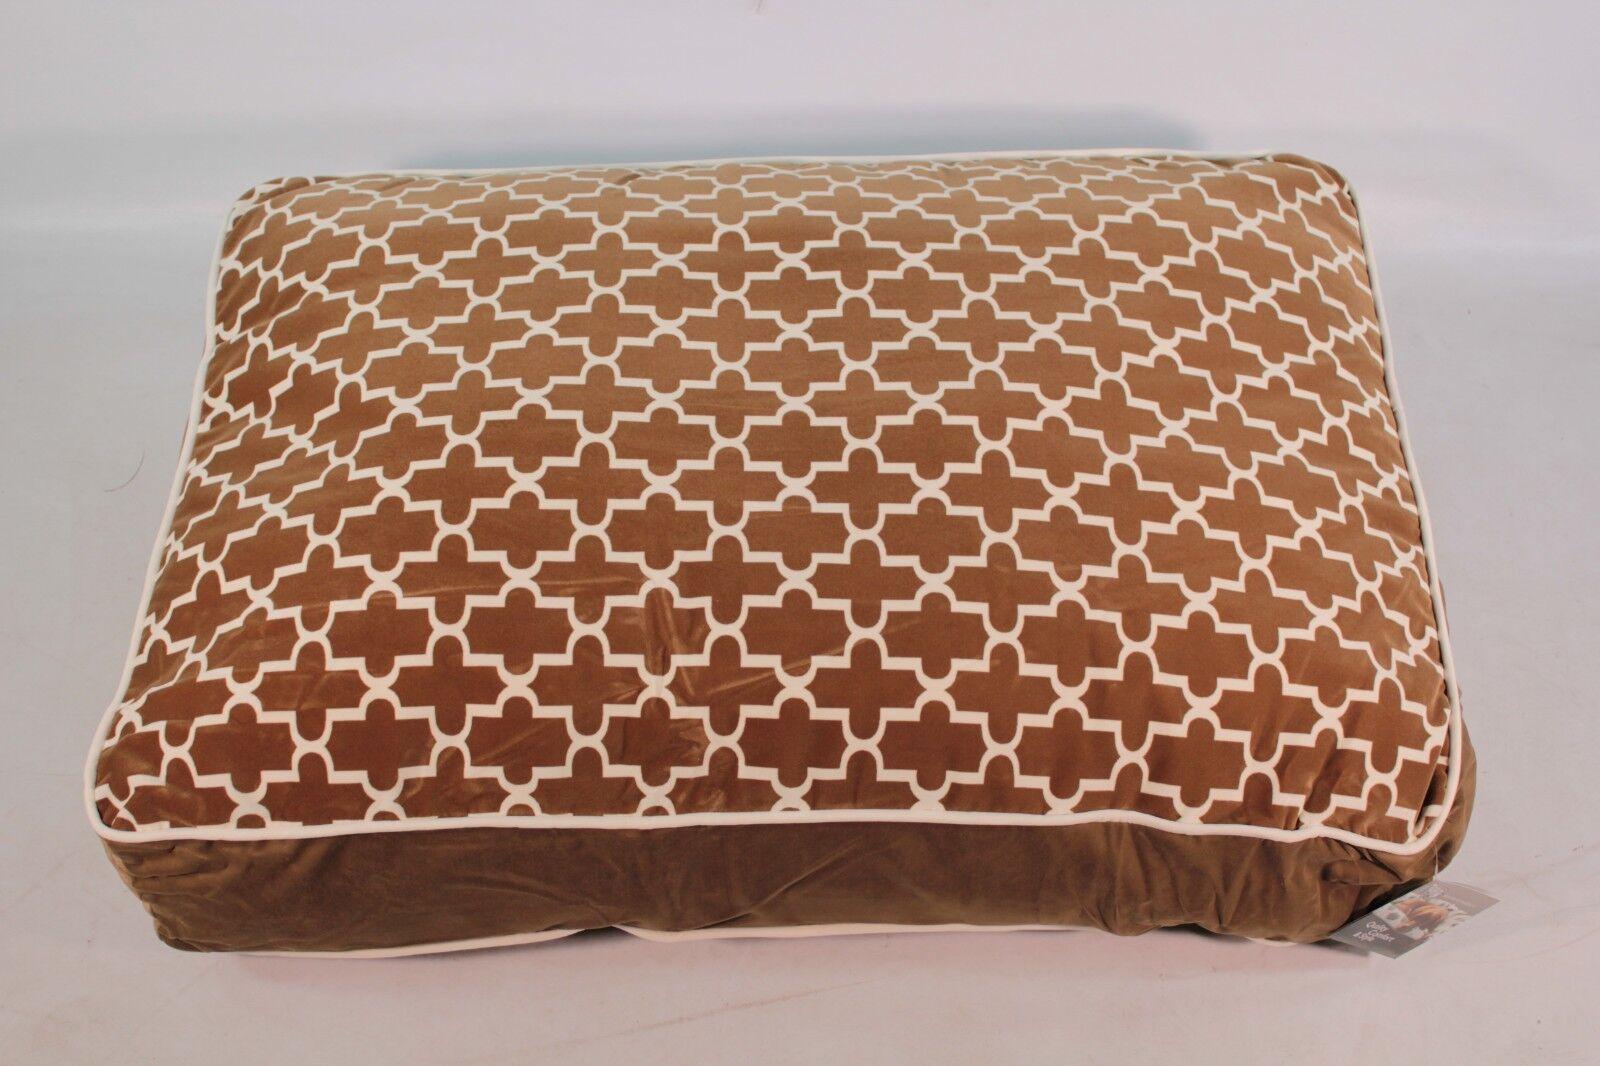 Bowsers Pet Products Super Loft Rectangle Dog Bed Large Cedar Lattice